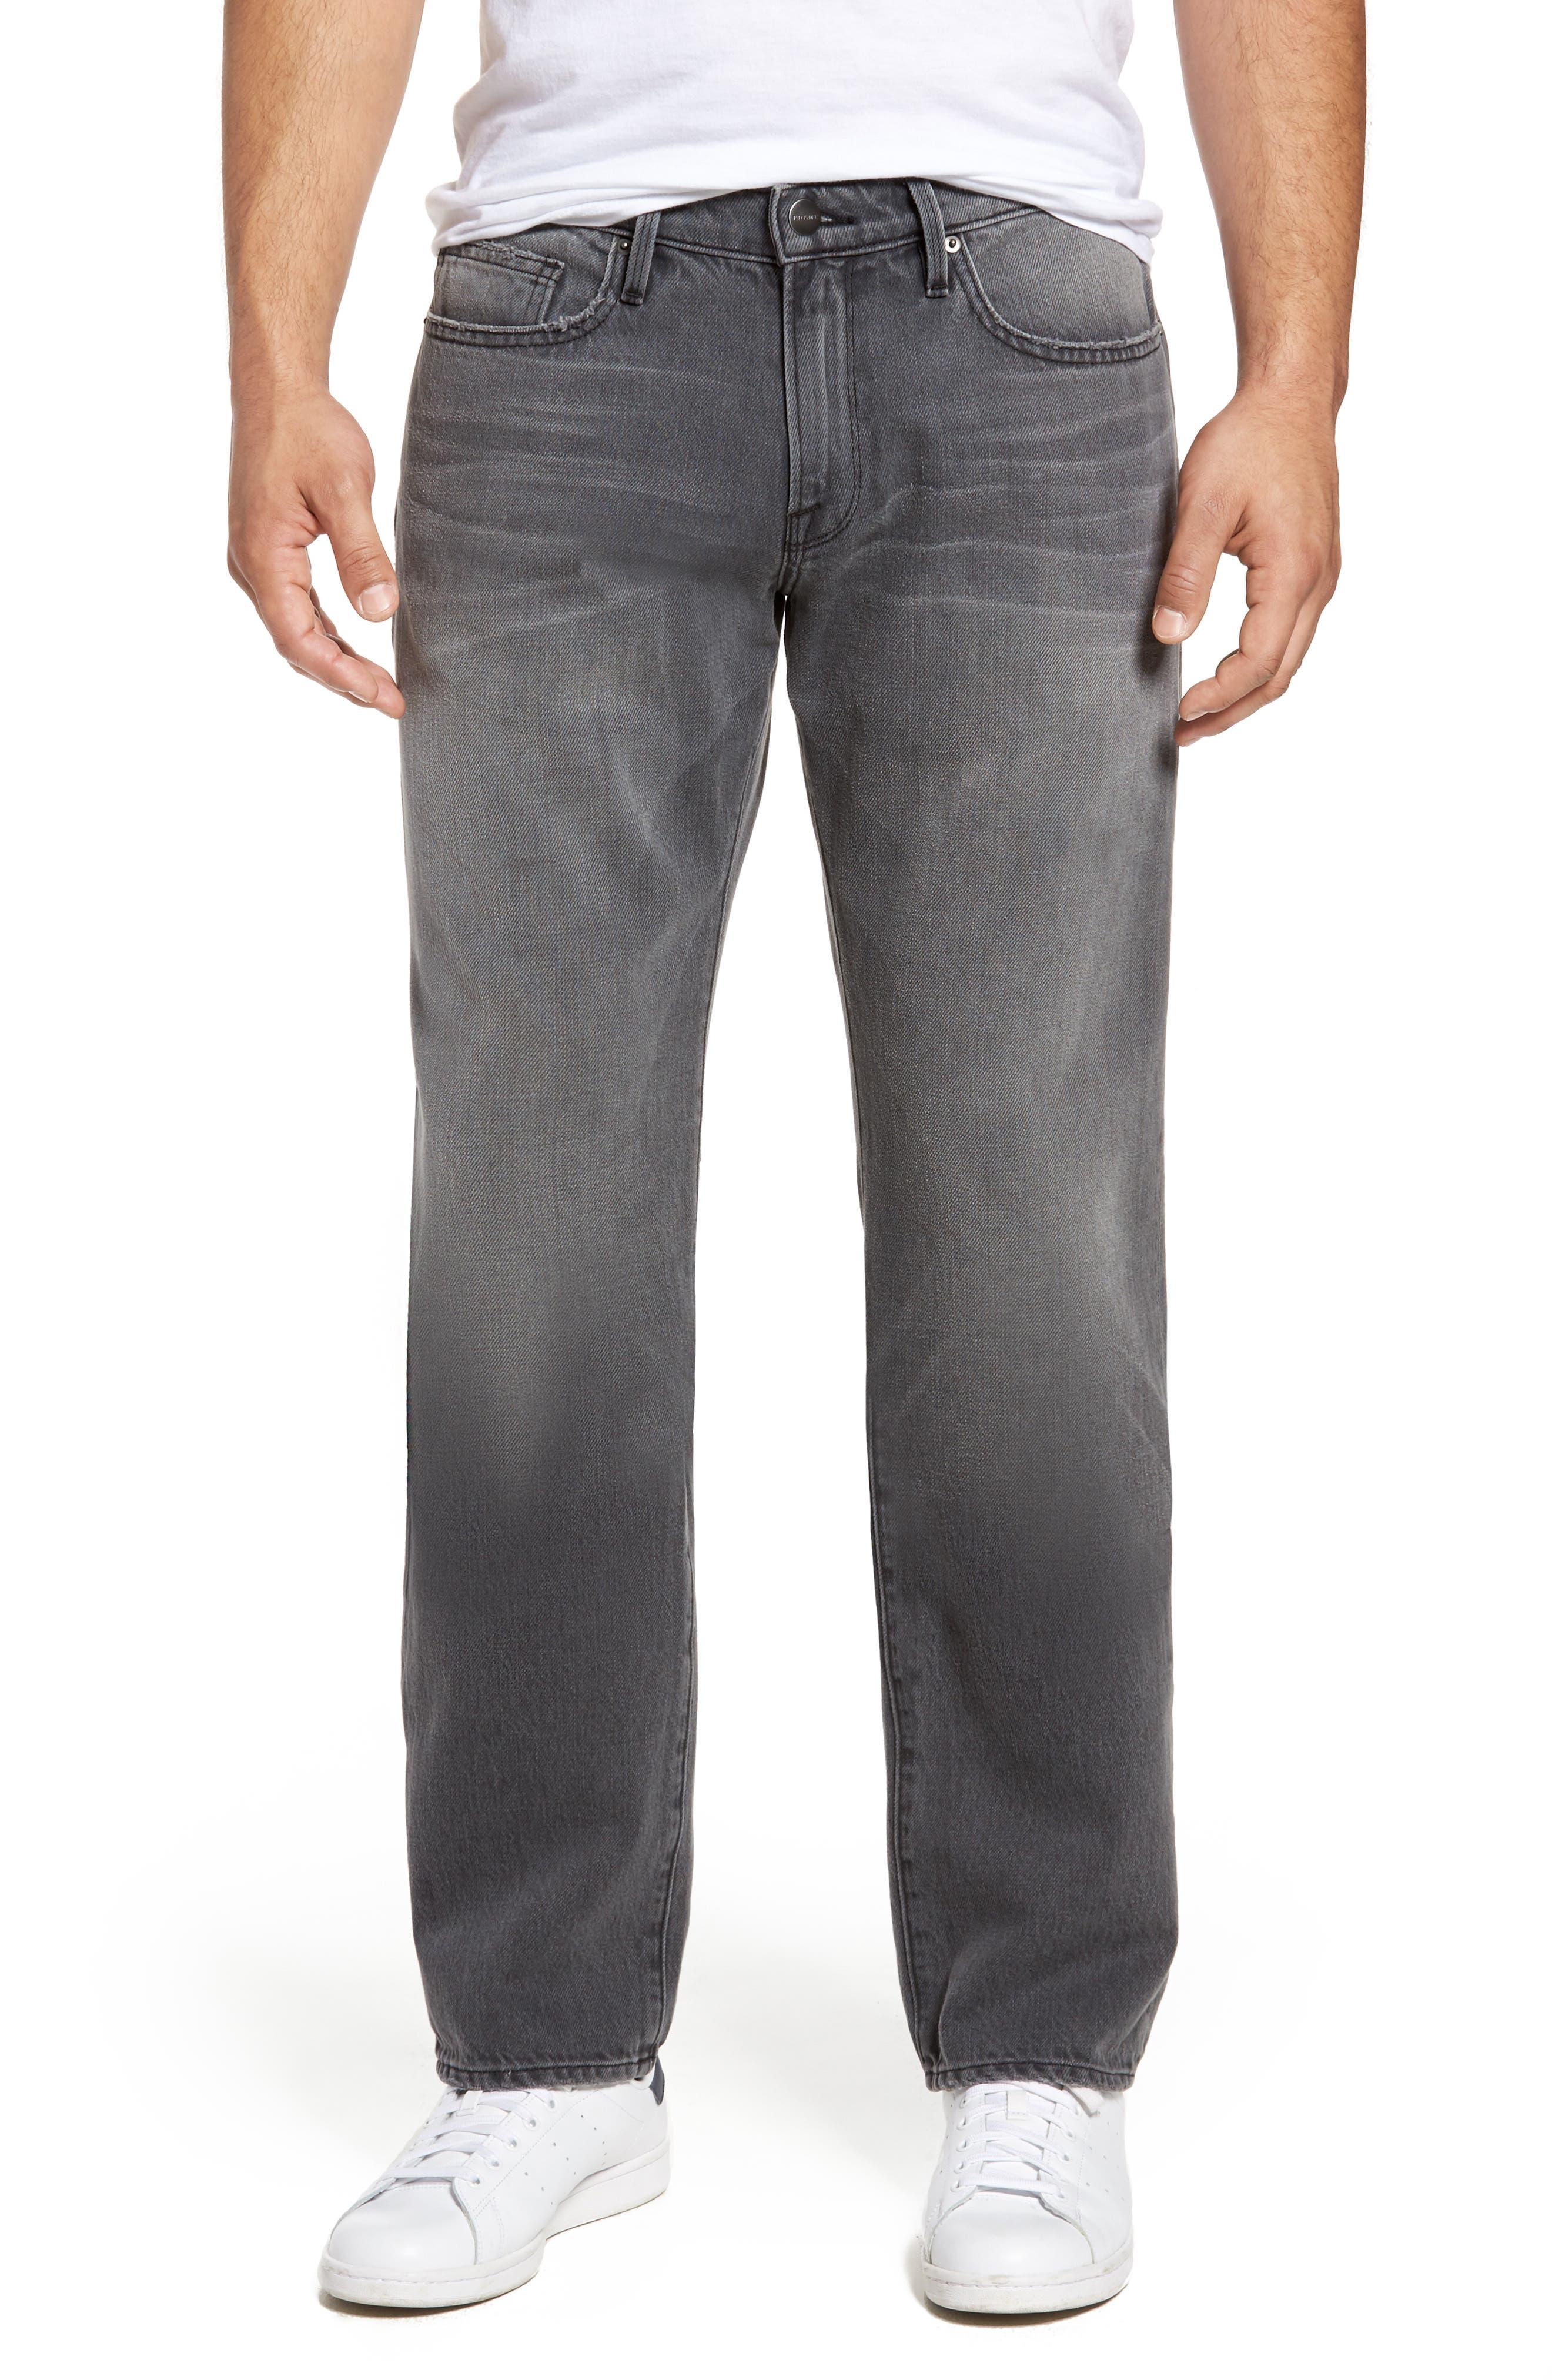 Alternate Image 1 Selected - FRAME L'Homme Slim Straight Leg Jeans (Commodore)